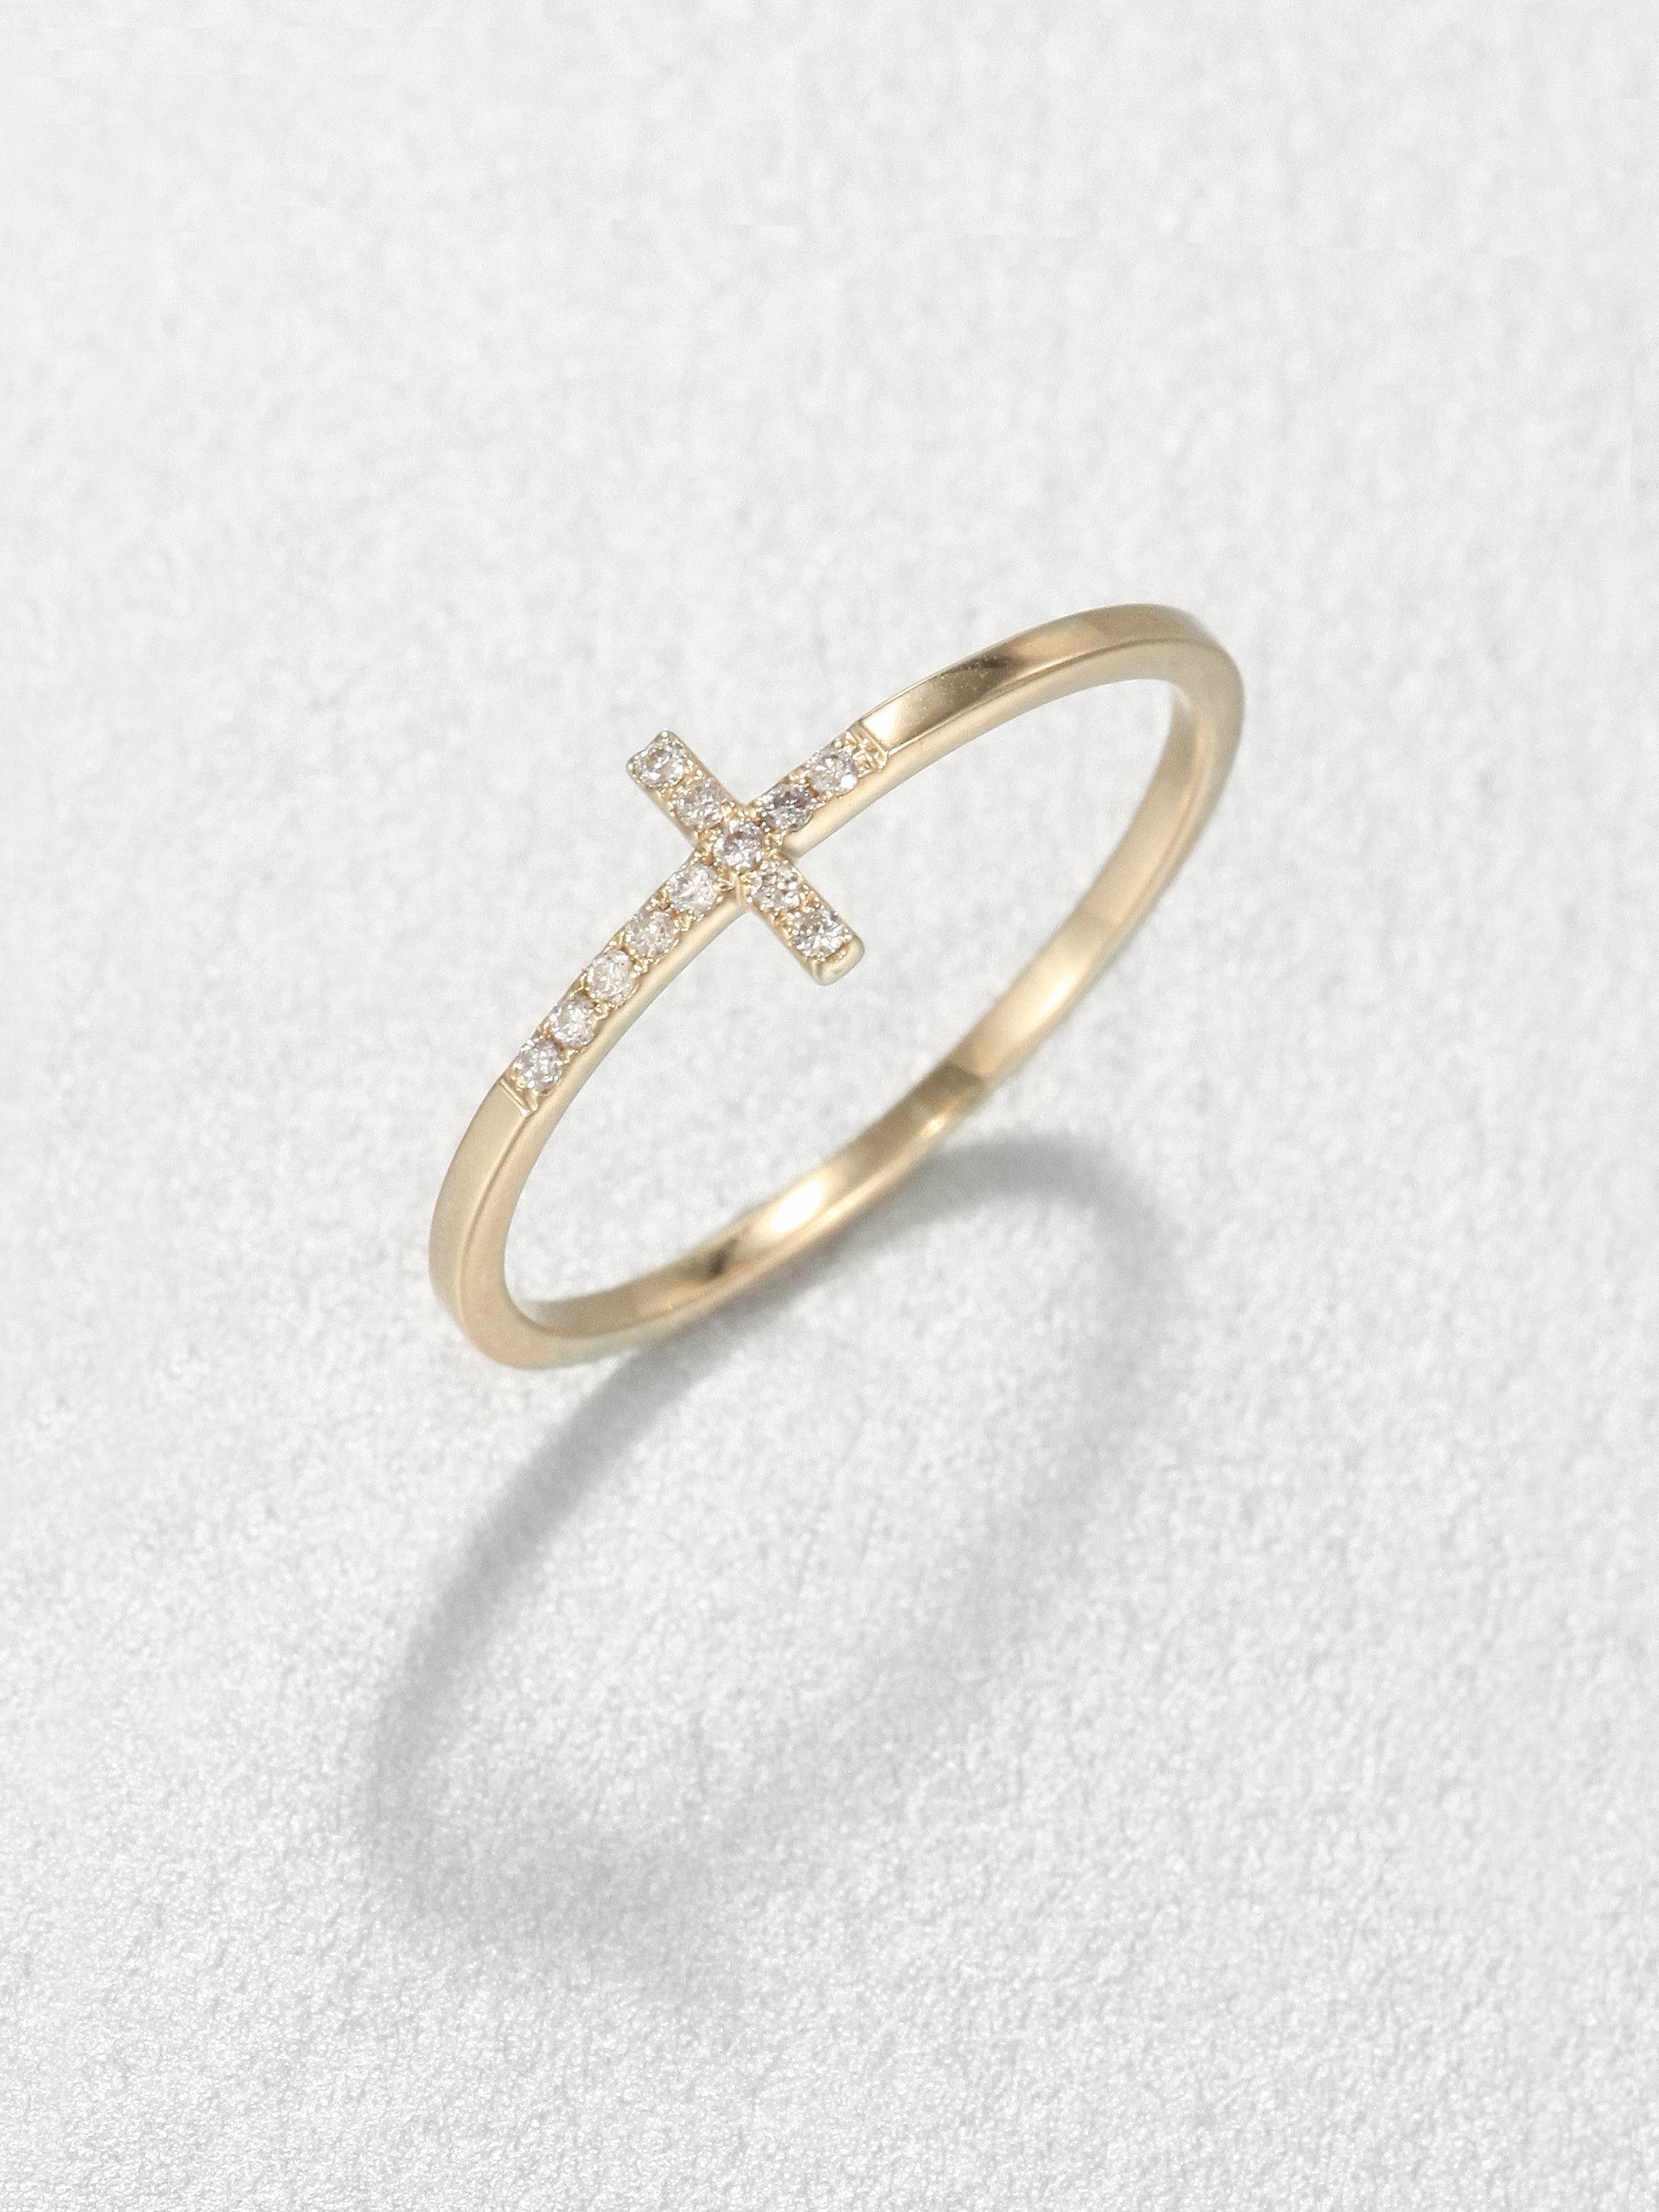 Sydney Evan Diamond Amp 14k Yellow Gold Bent Cross Ring In